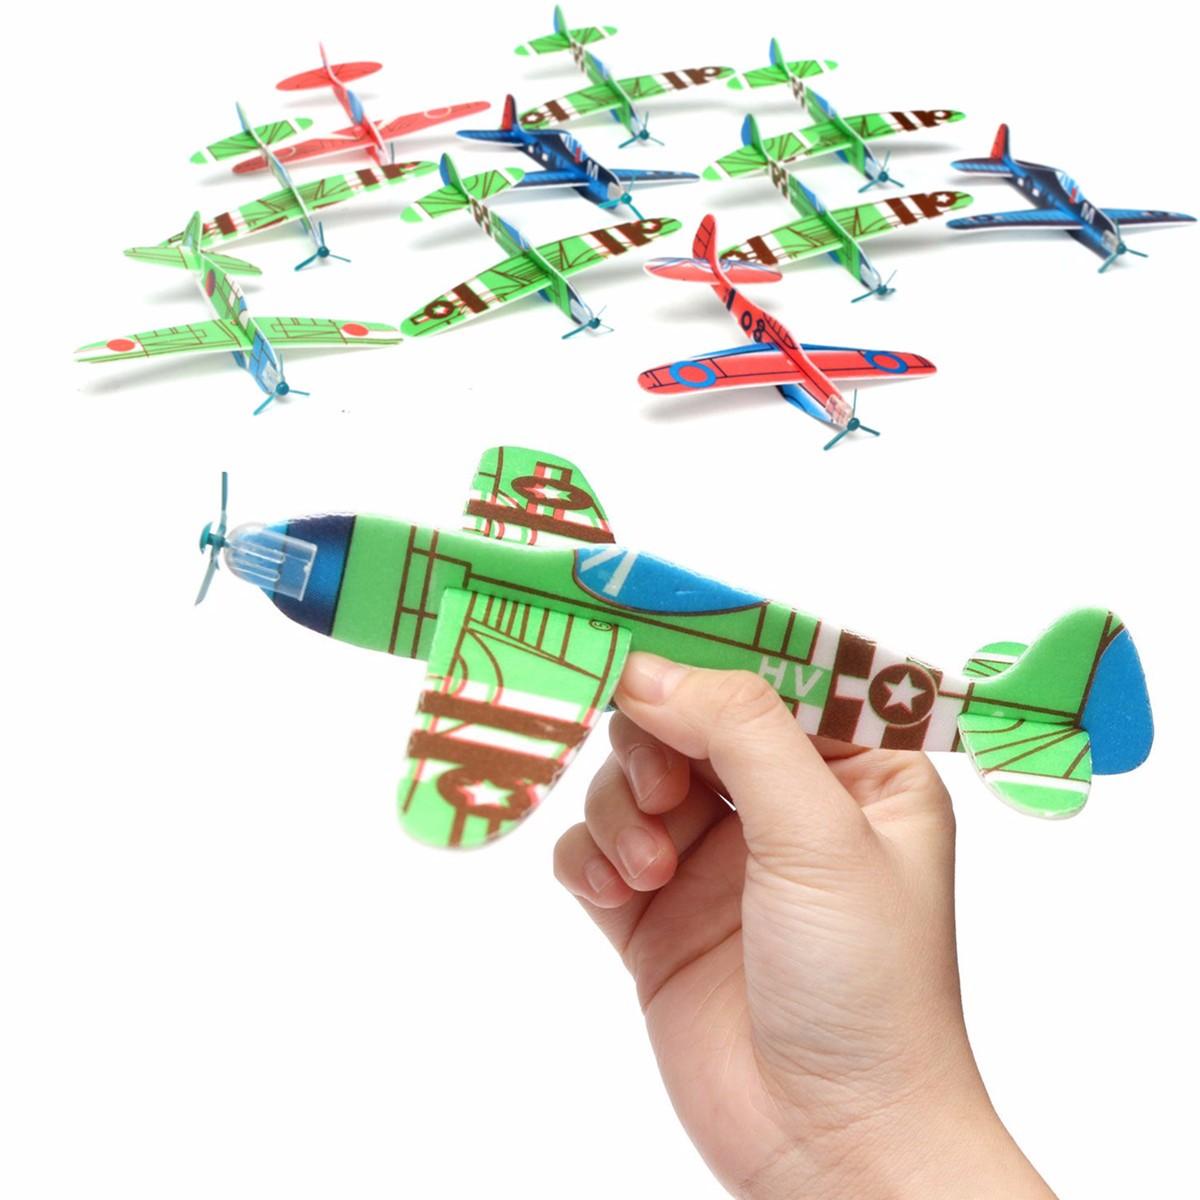 10Pcs Banggood Flying Glider Plane Toy Gift Birthday Christmas Party Bag Filler